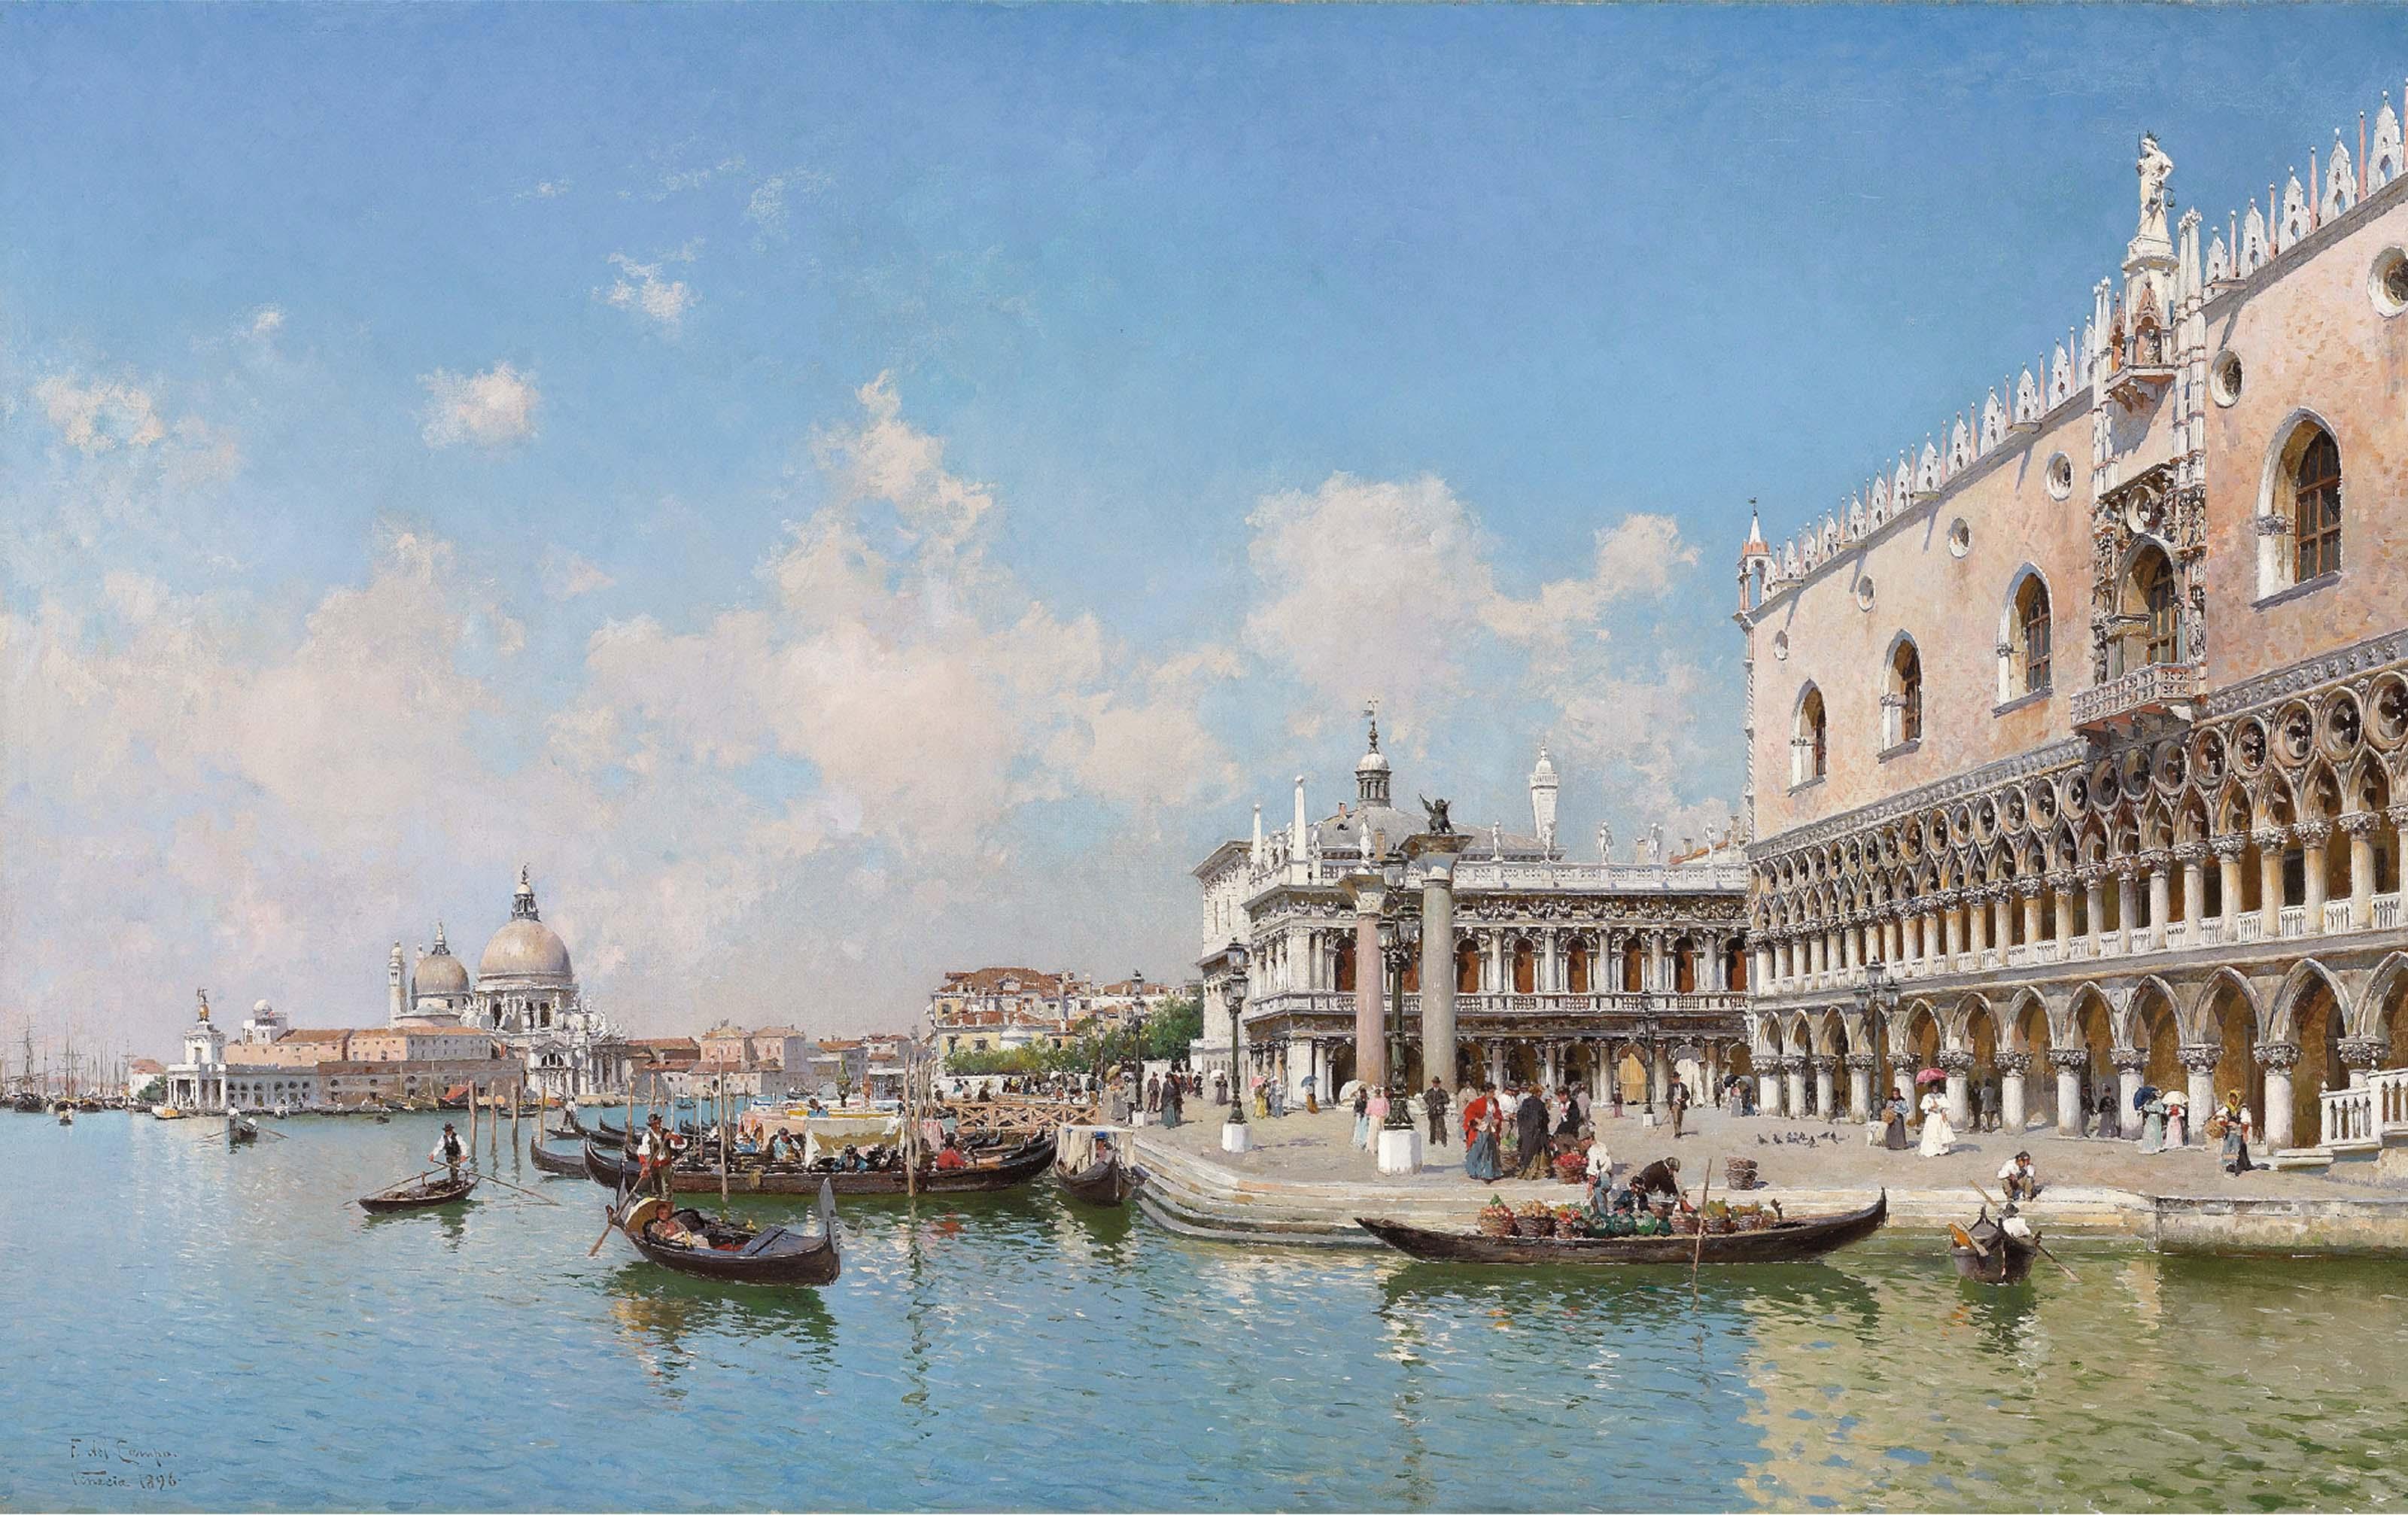 The Doge's Palace and Santa Maria della Salute